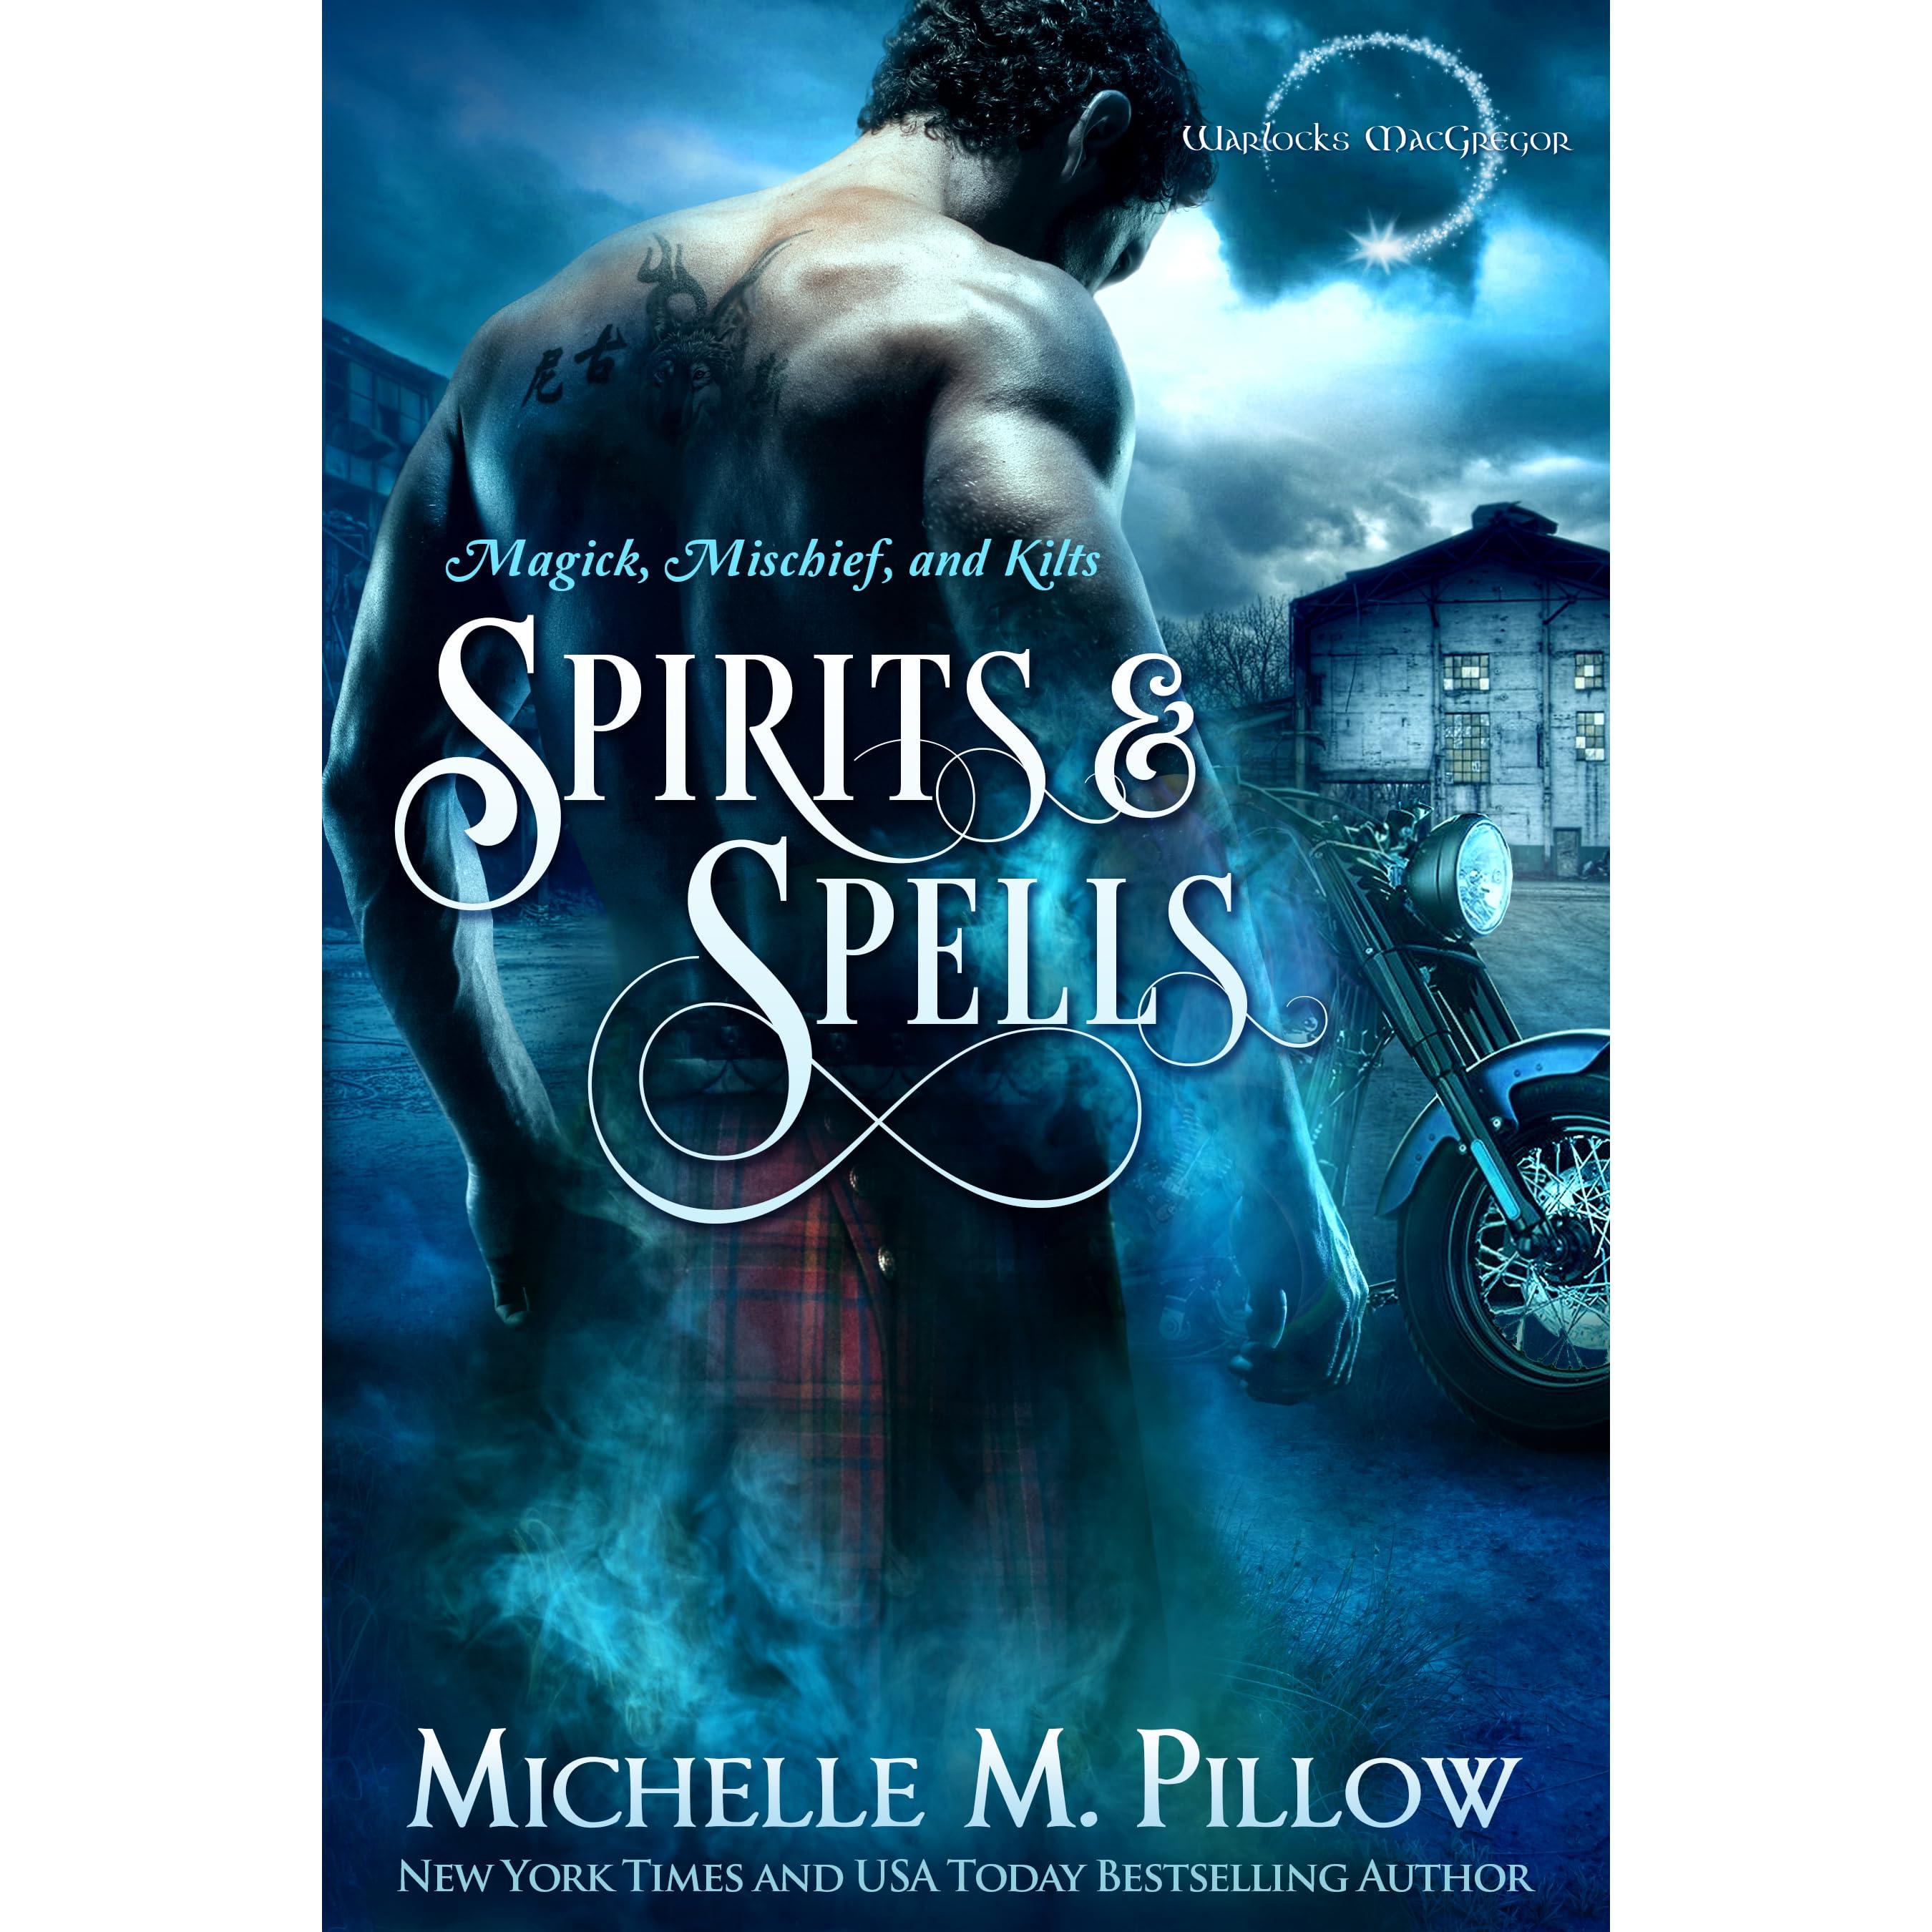 Spirits and Spells (Warlocks MacGregor, #5) by Michelle M